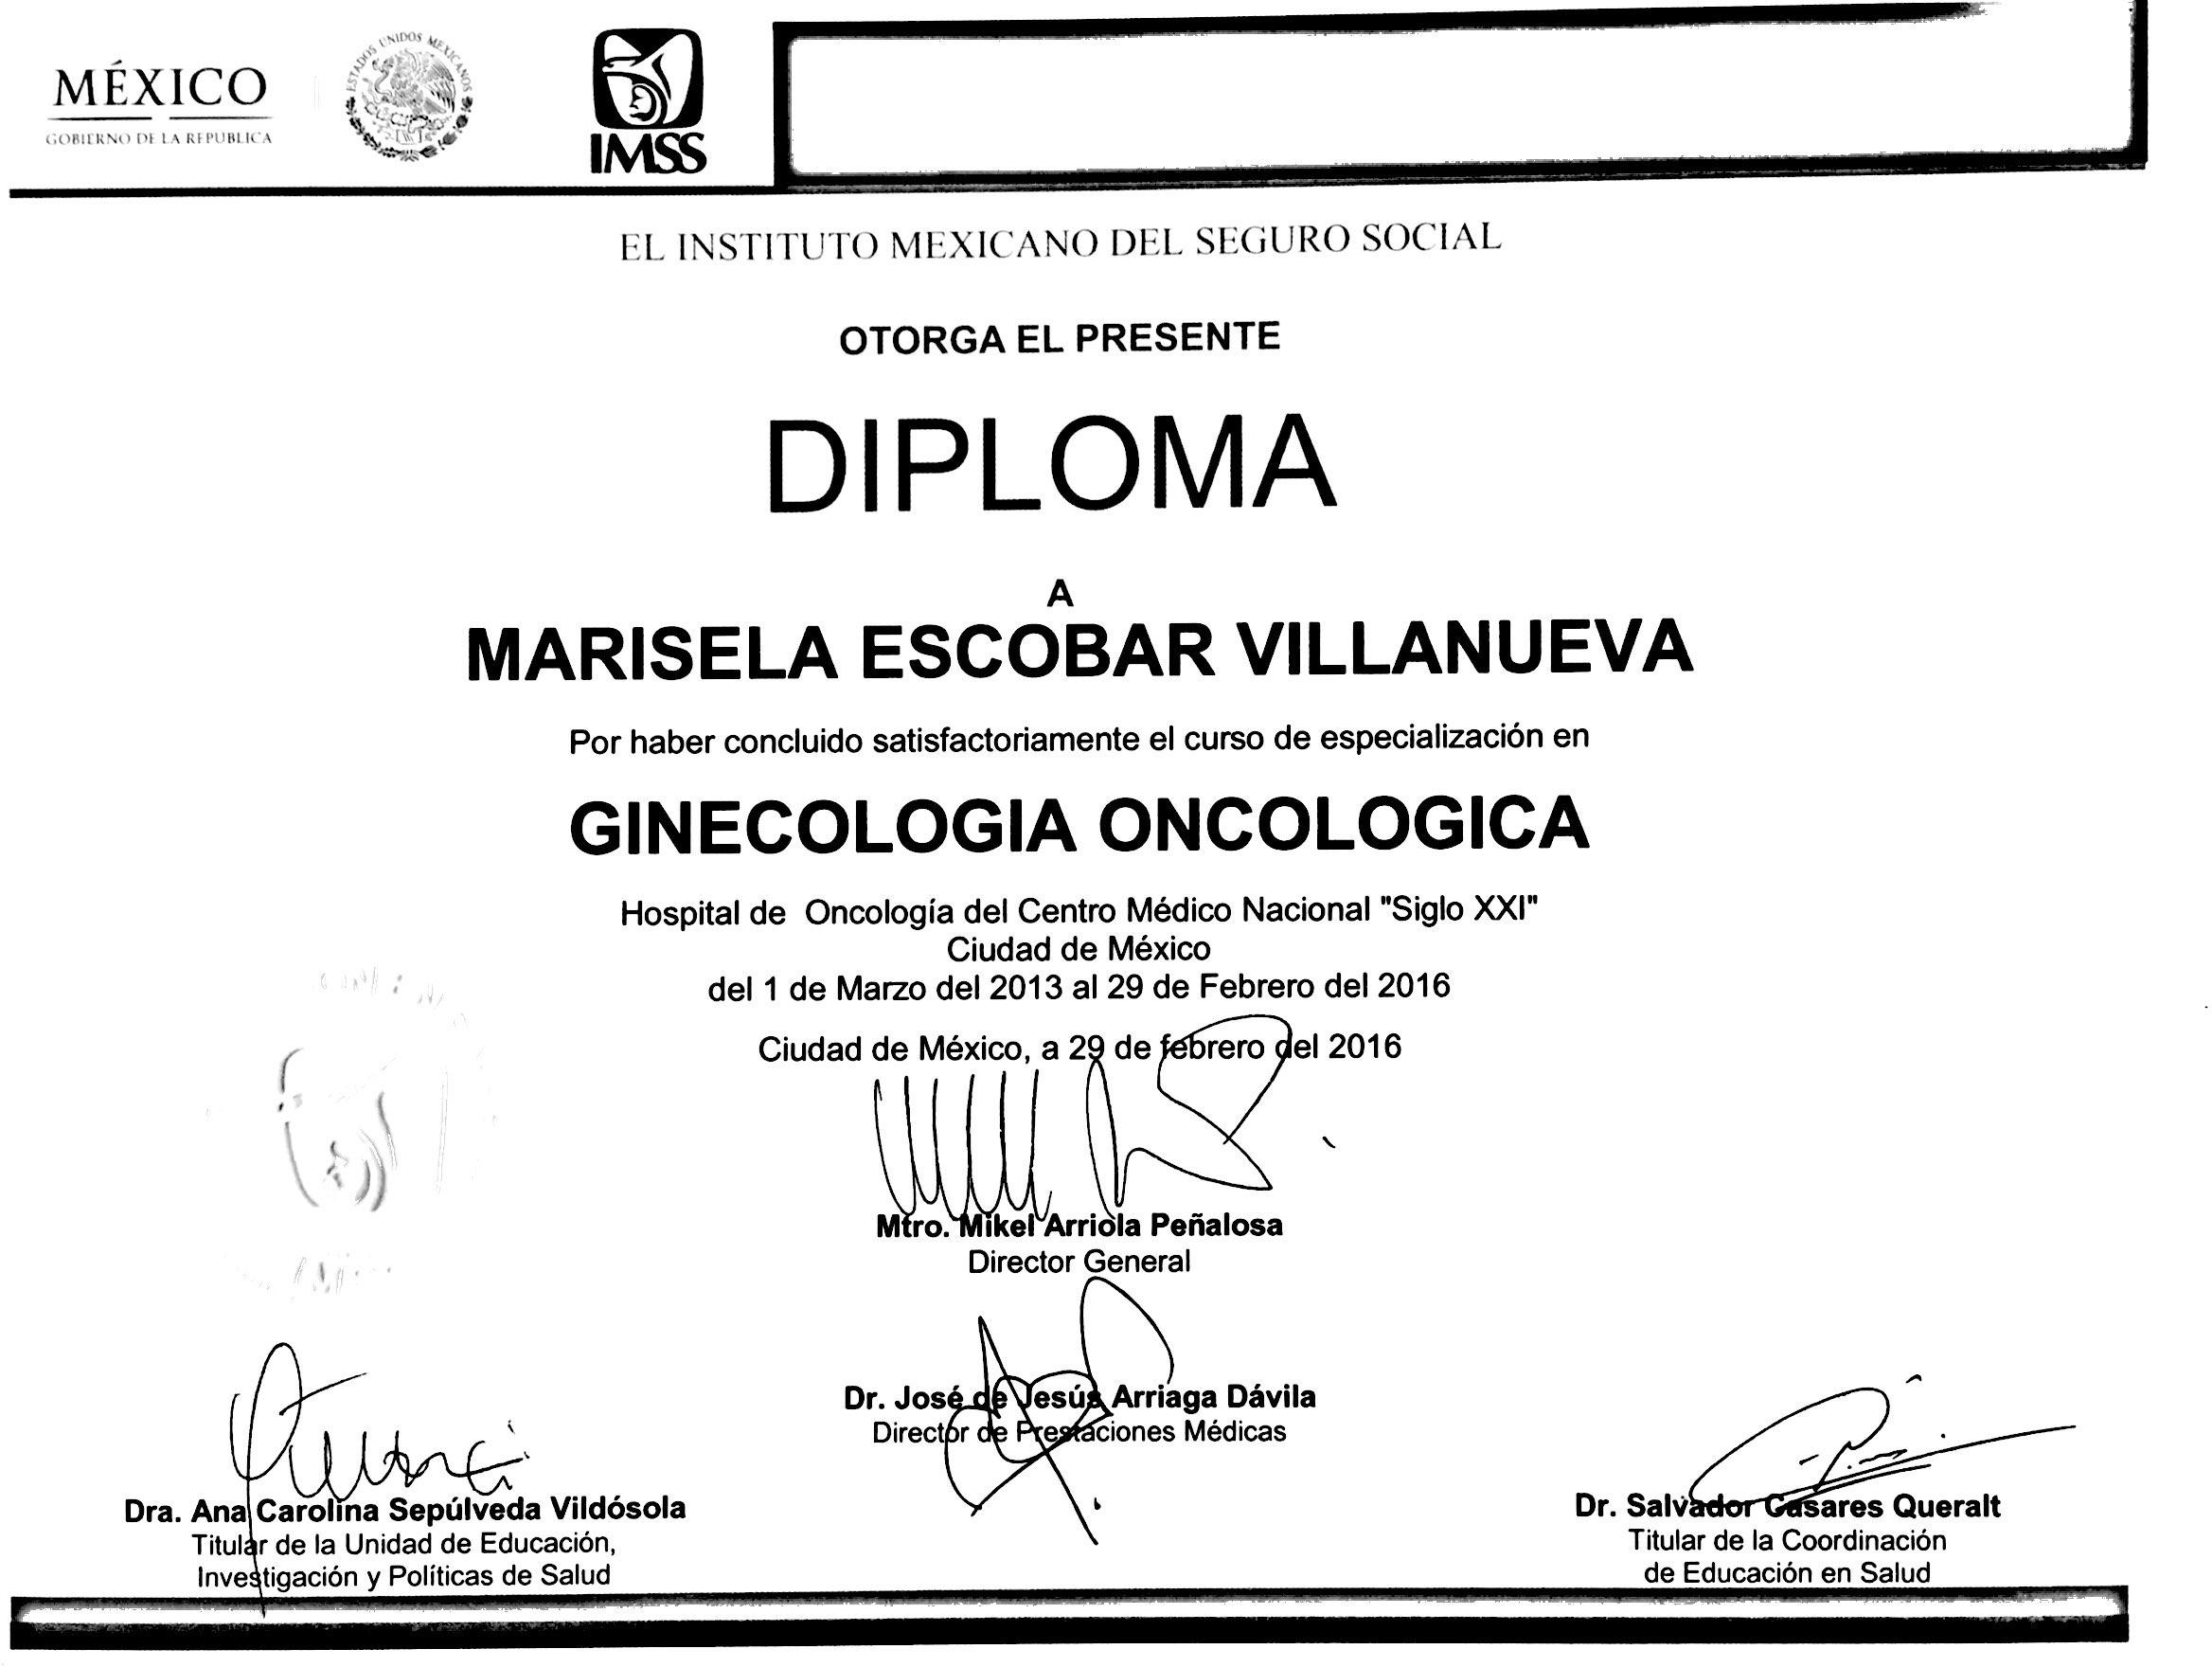 Nuevo doc 2018-02-20 11.21.39_3